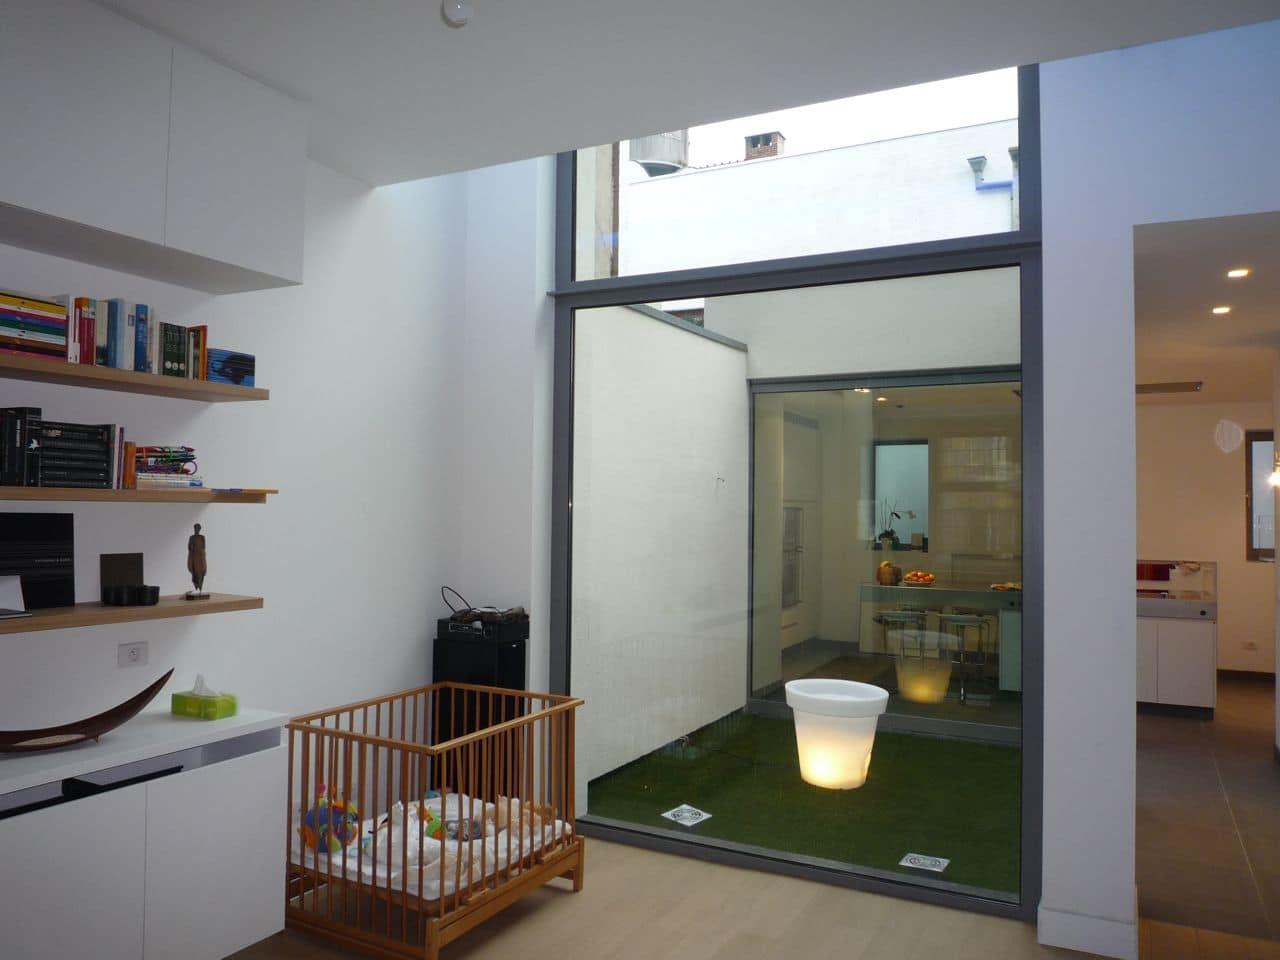 P1050558 | Baeyens & Beck architecten Gent | architect nieuwbouw renovatie interieur | high end | architectenbureau